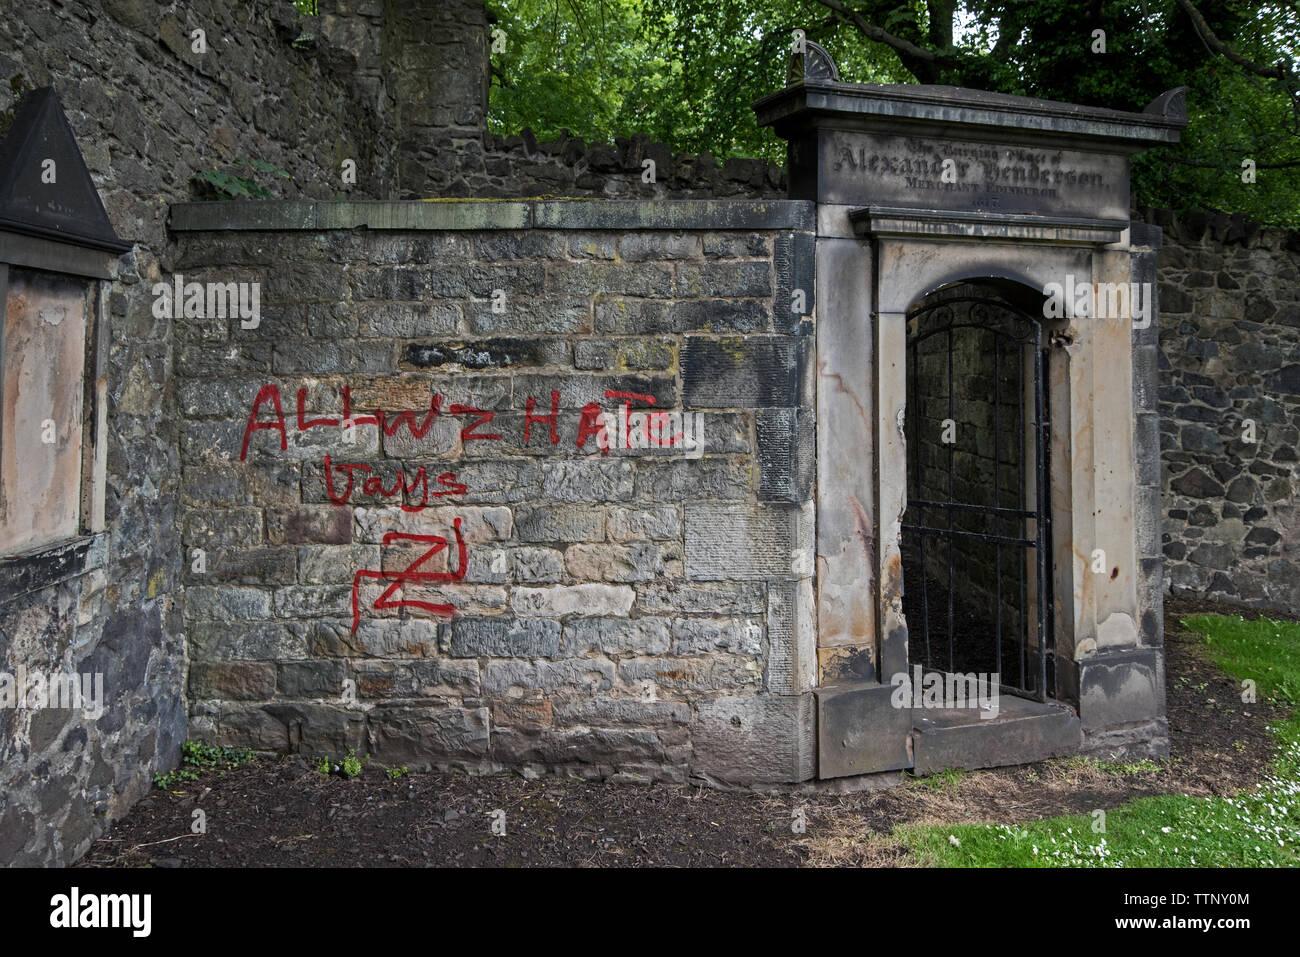 Swastikas and homophobic graffiti painted on tombs in New Calton Burial Ground, Edinburgh, Scotland, UK. June 2019. - Stock Image